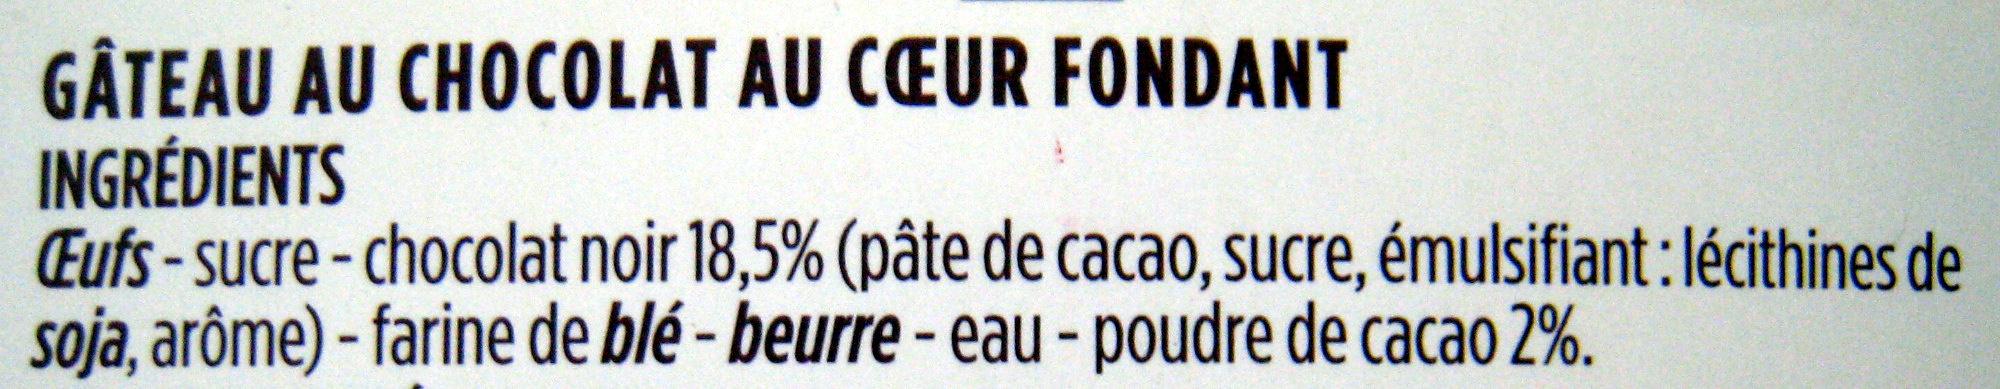 Coeur fondant au chocolat noir - Ingredients - fr